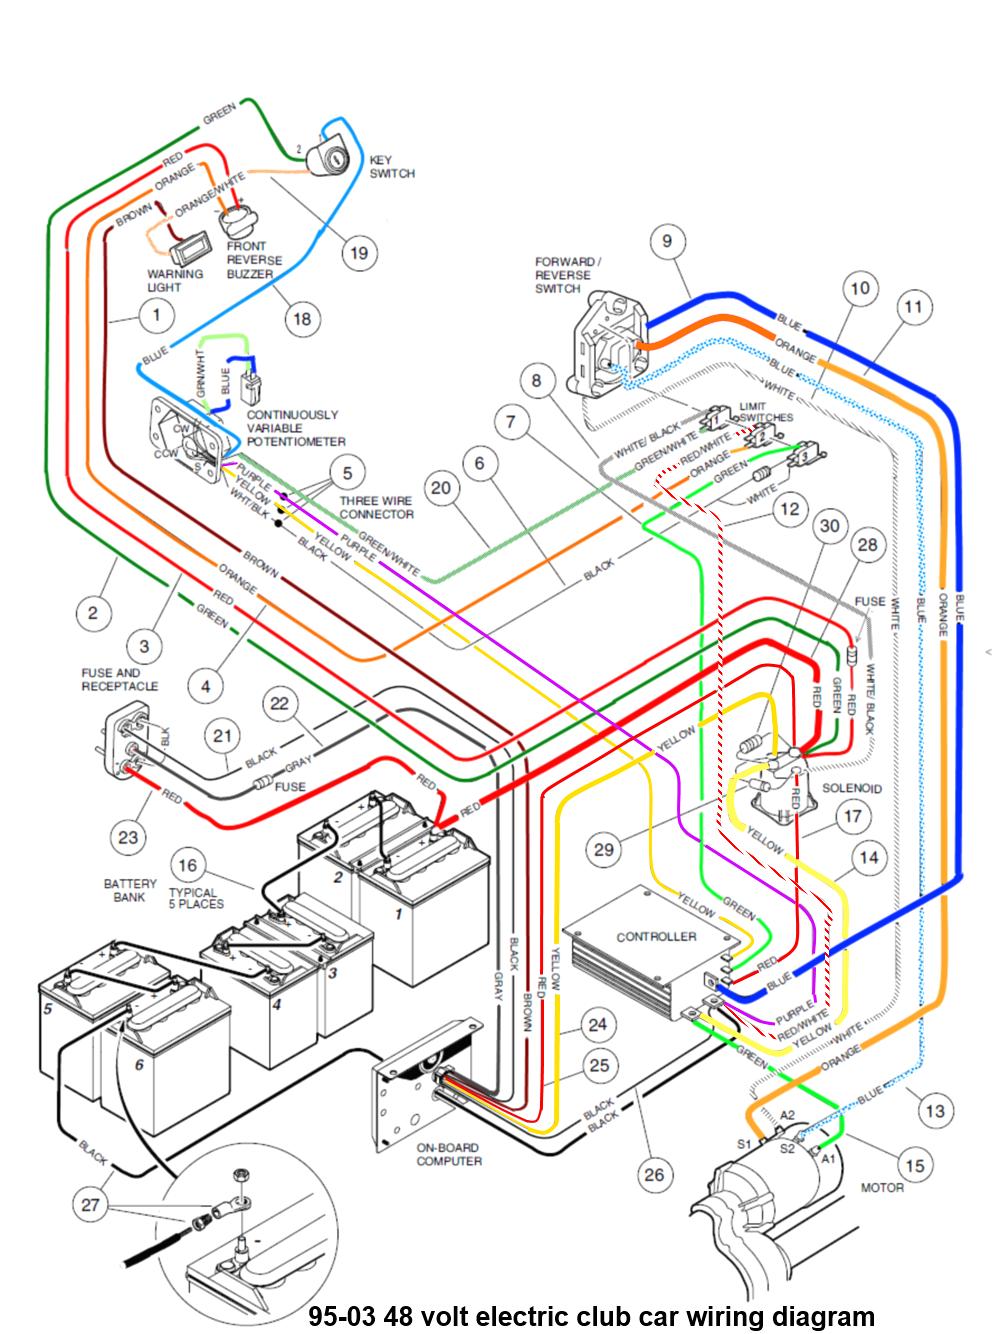 Https Bacamajalah Com The 23 Best Wiring Diagram Drawing Software Samples Diagram Drawing Club Car Golf Cart Electrical Wiring Diagram Ezgo Golf Cart